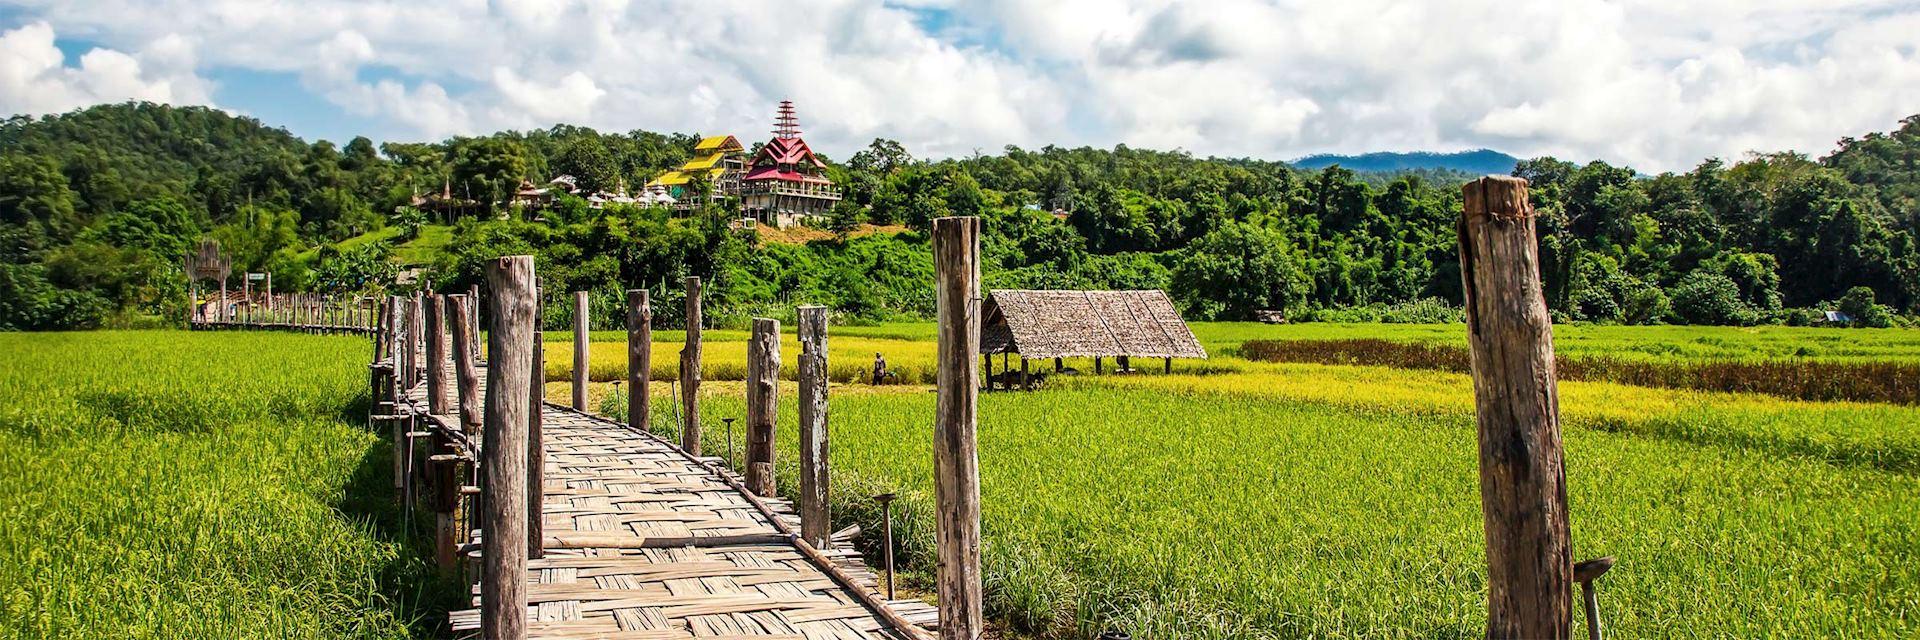 Rice field in Mae Hong Son